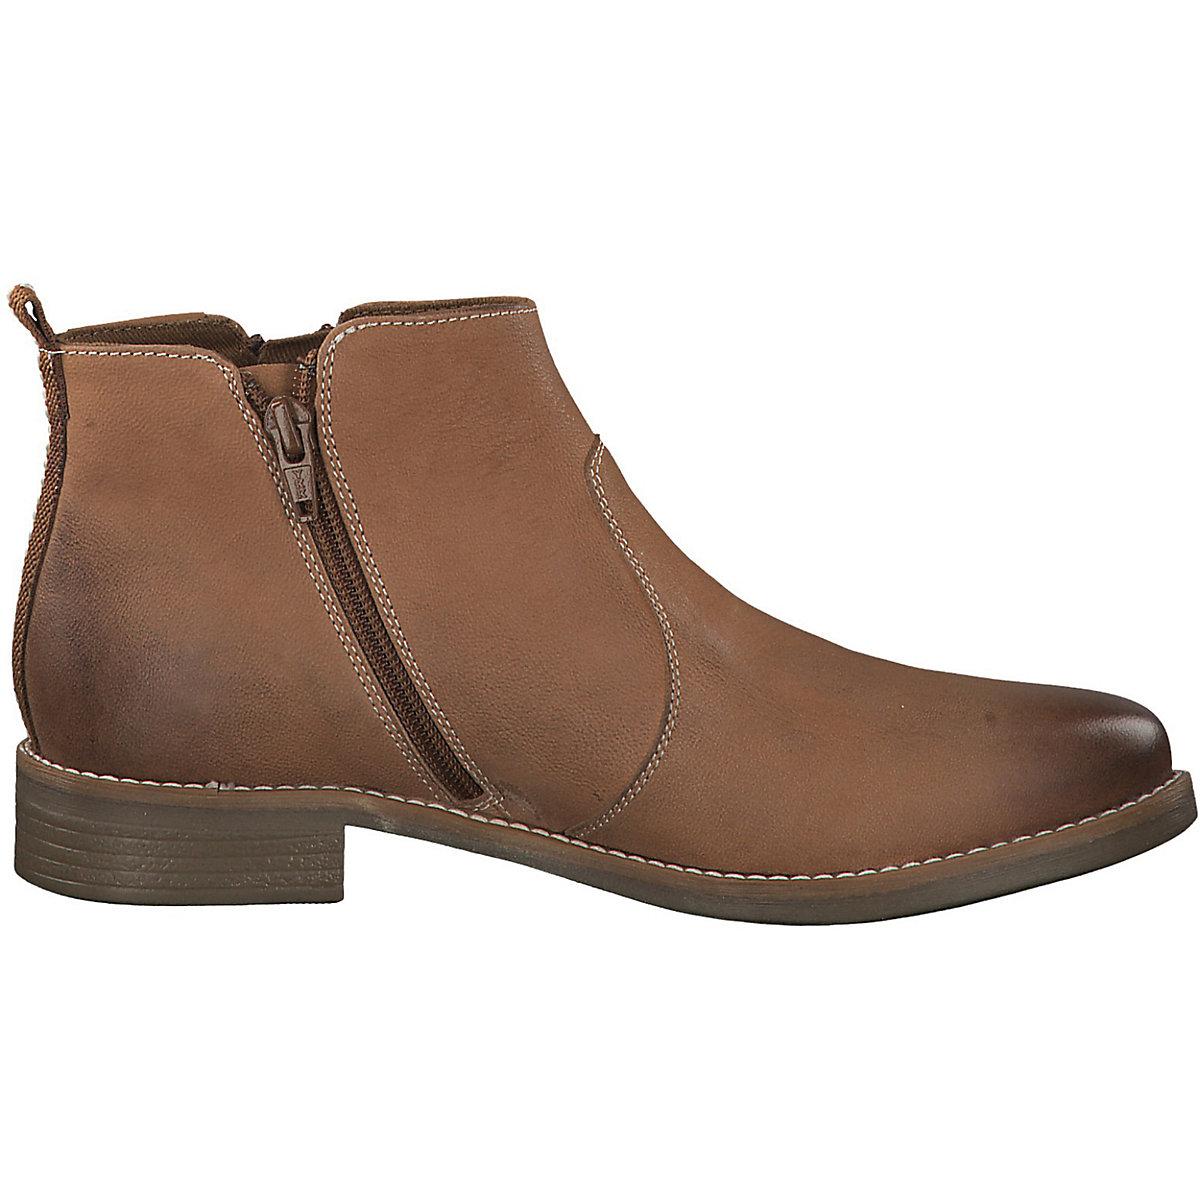 S.oliver, Chelsea Boots, Cognac